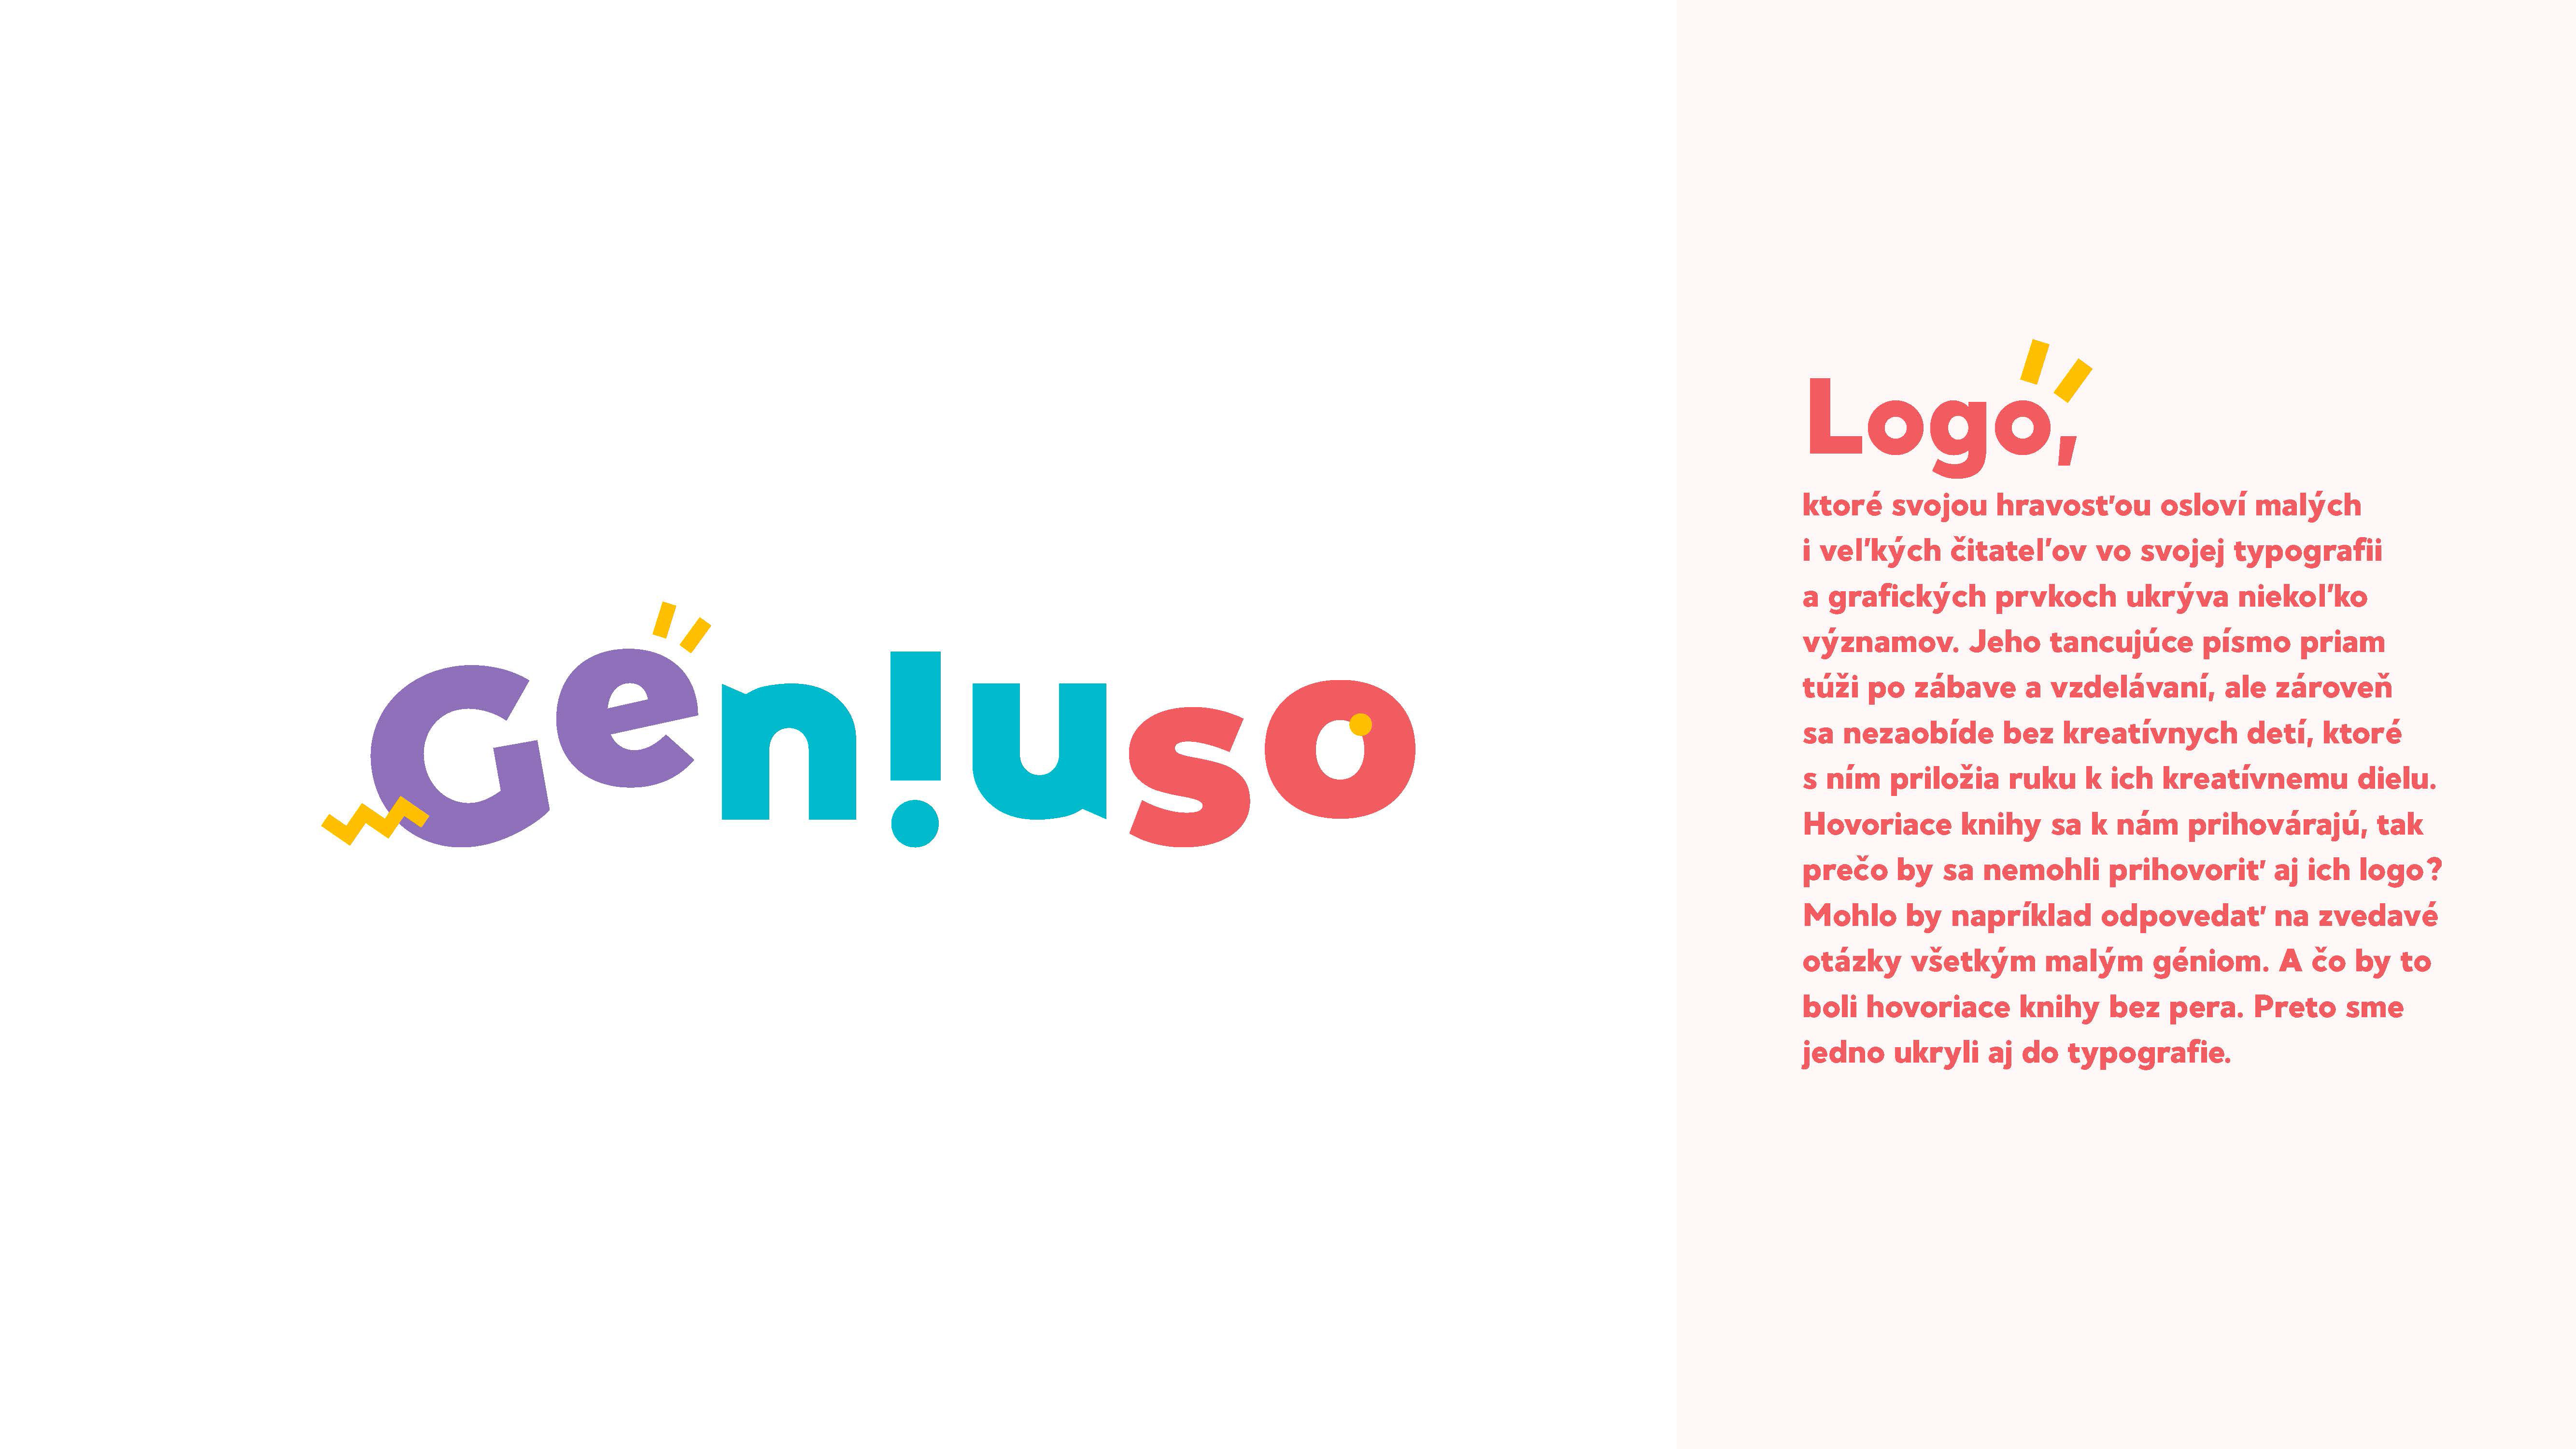 logo, brand identity, visual identity, dizajn, design